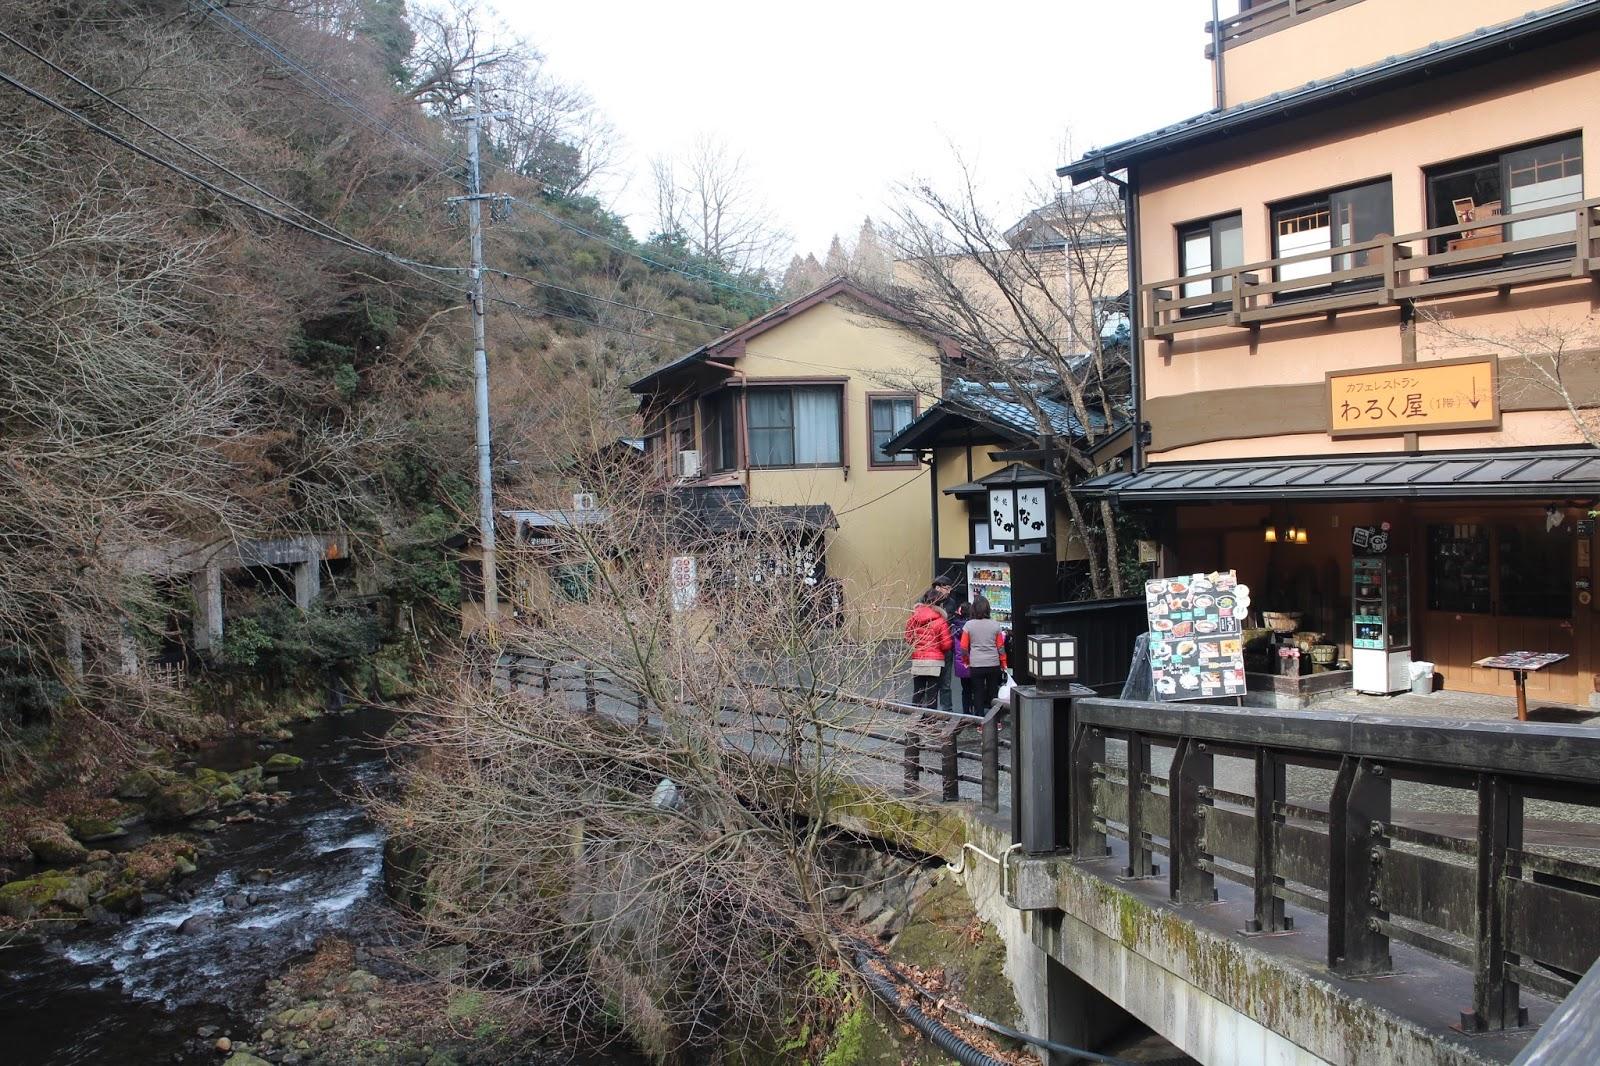 SukyLIMakeUp: Day 5 - 2015年1月28日 九州自駕遊-阿蘇神社,阿蘇火山,白川水源